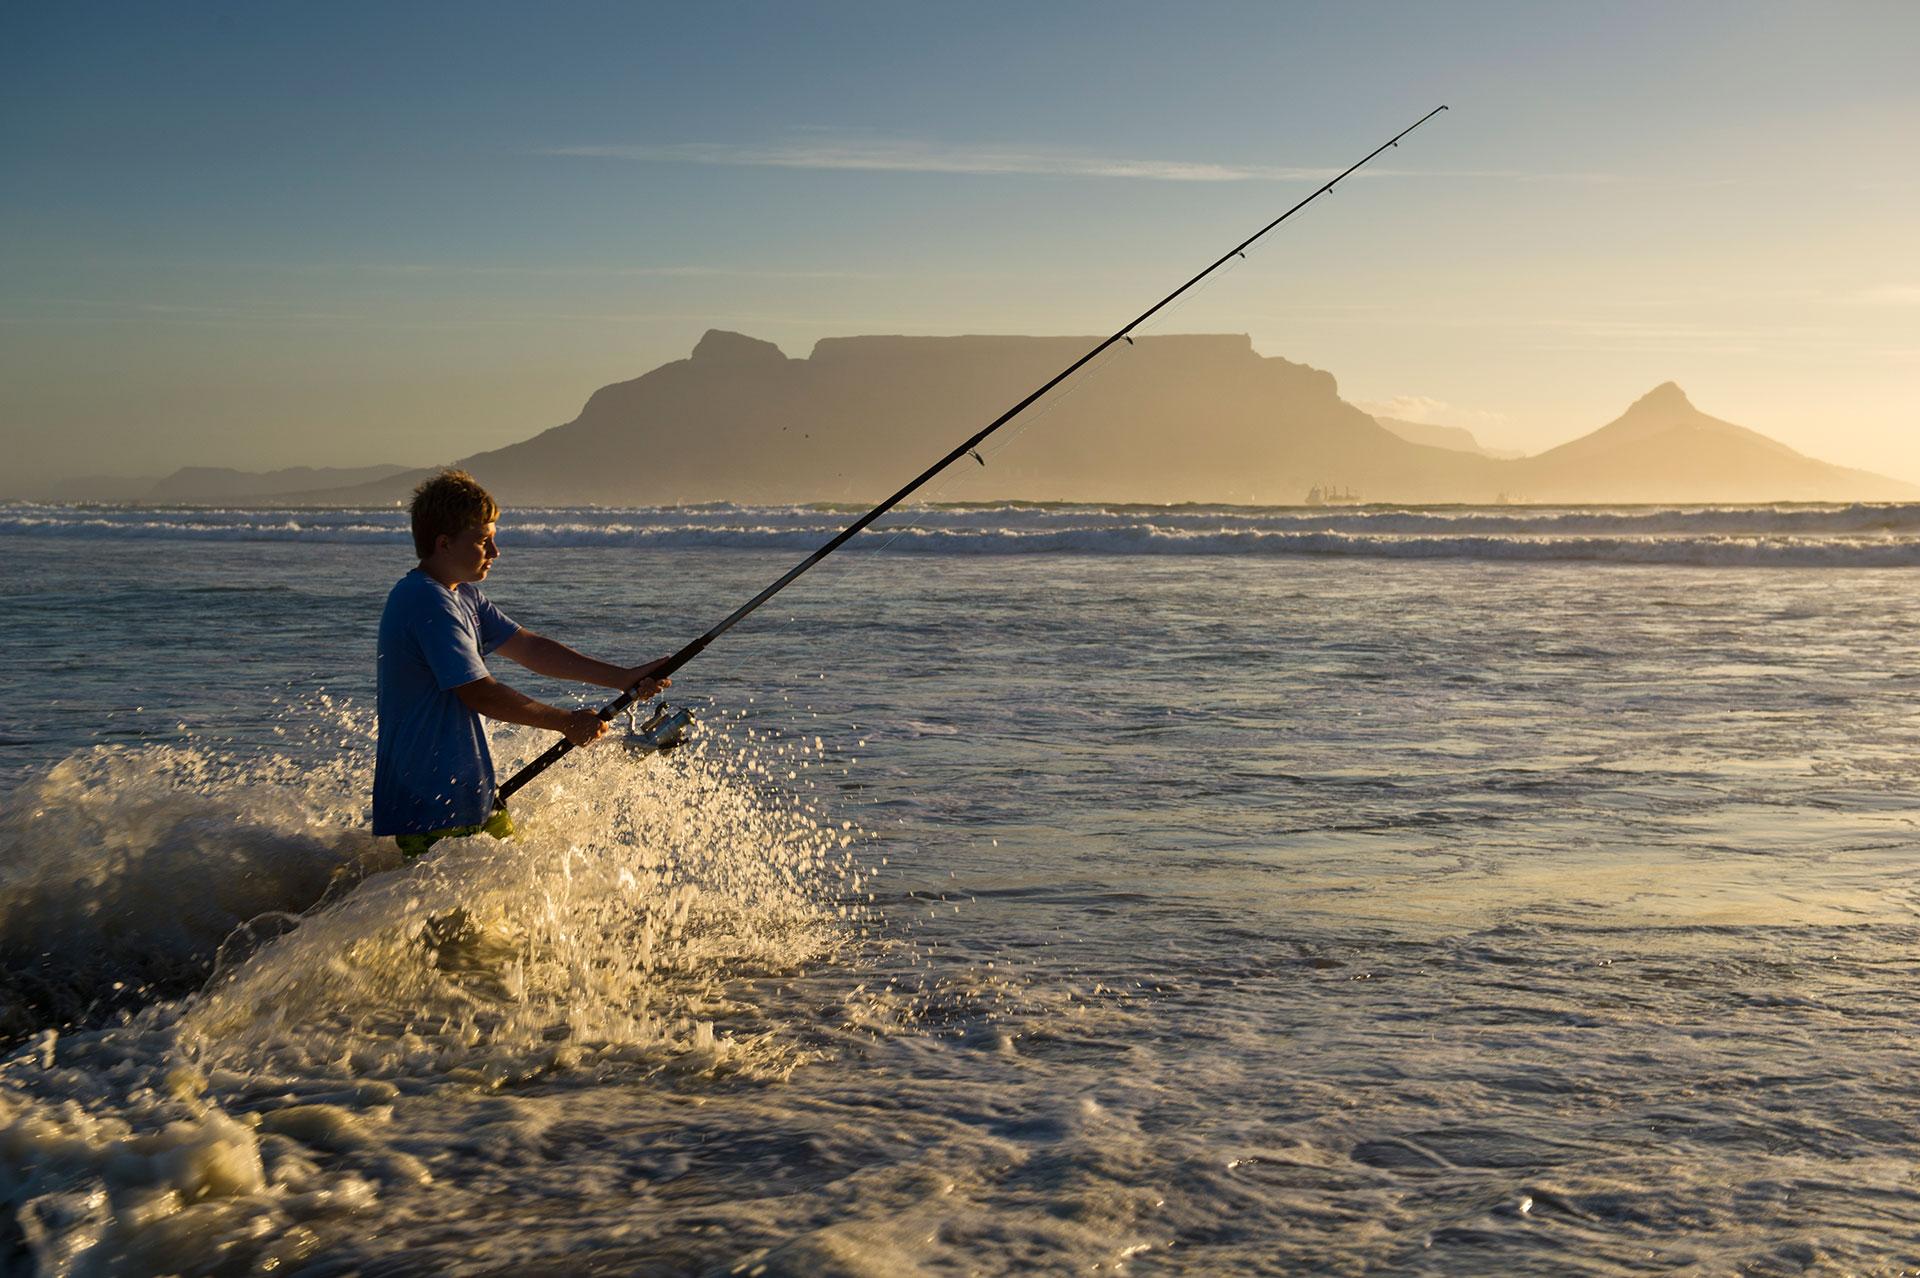 Südafrika in Kapstadt junger Angler in der Brandung vor dem Tafelberg